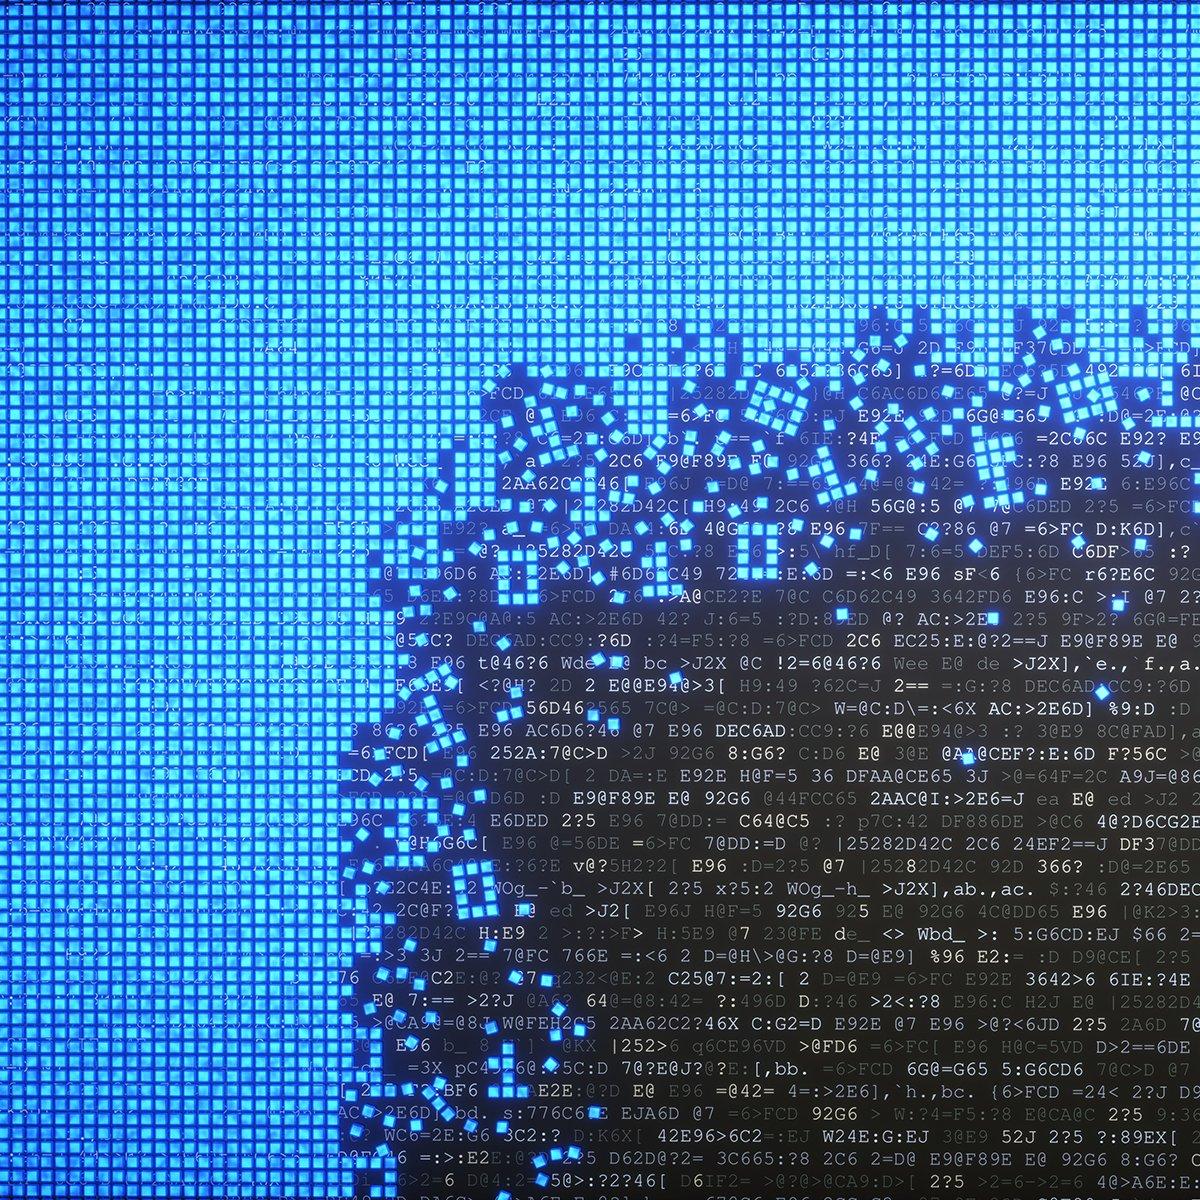 How big data is improving inventory management across industries #bigdata #businessintelligence  https://www. criticalfutureglobal.com/how-big-data-i s-improving-inventory-management-across-industries/ &nbsp; … <br>http://pic.twitter.com/1bPPZQvfTG